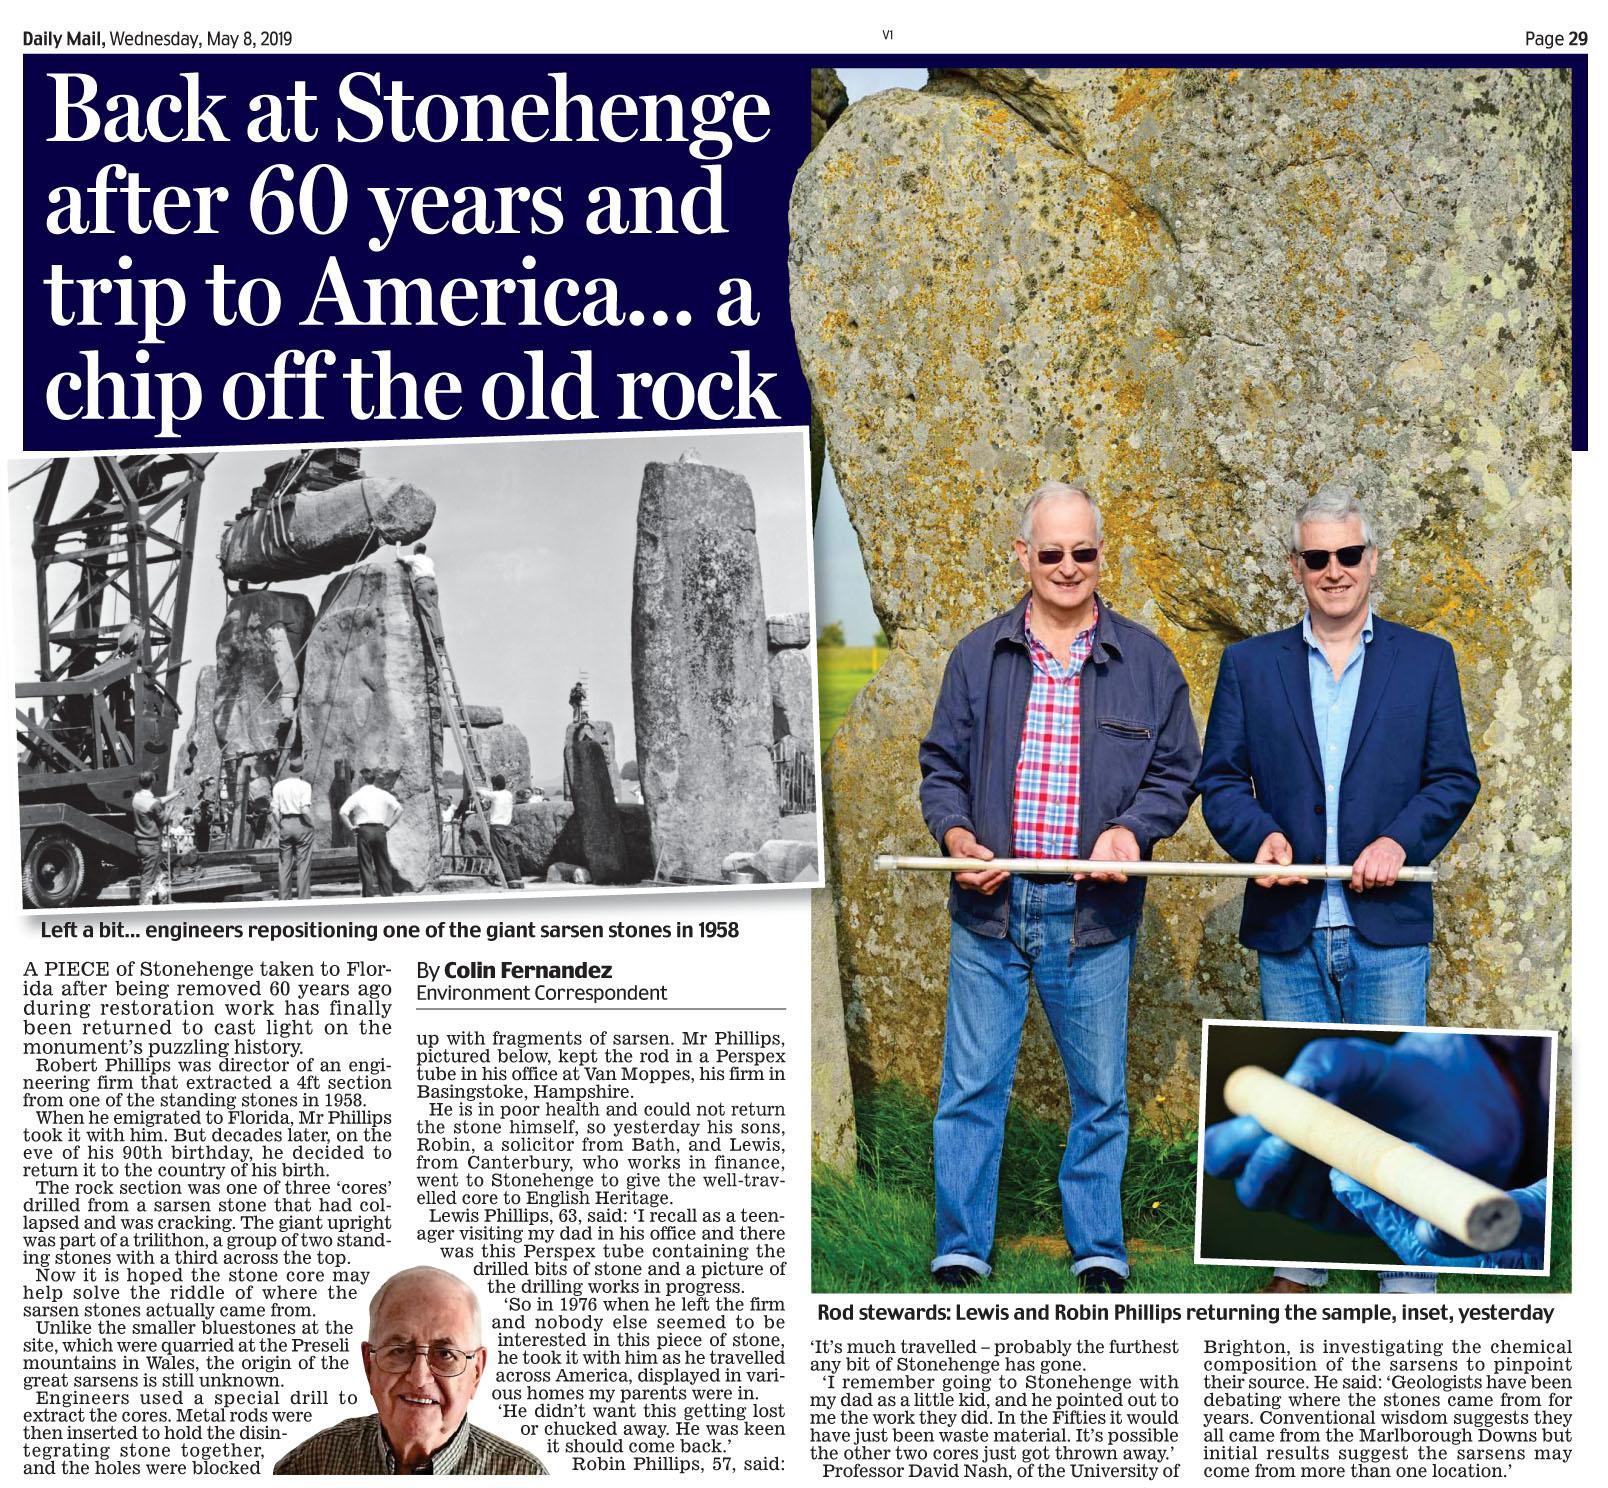 Daily Mail May 8 2019 Stonehendge.jpg